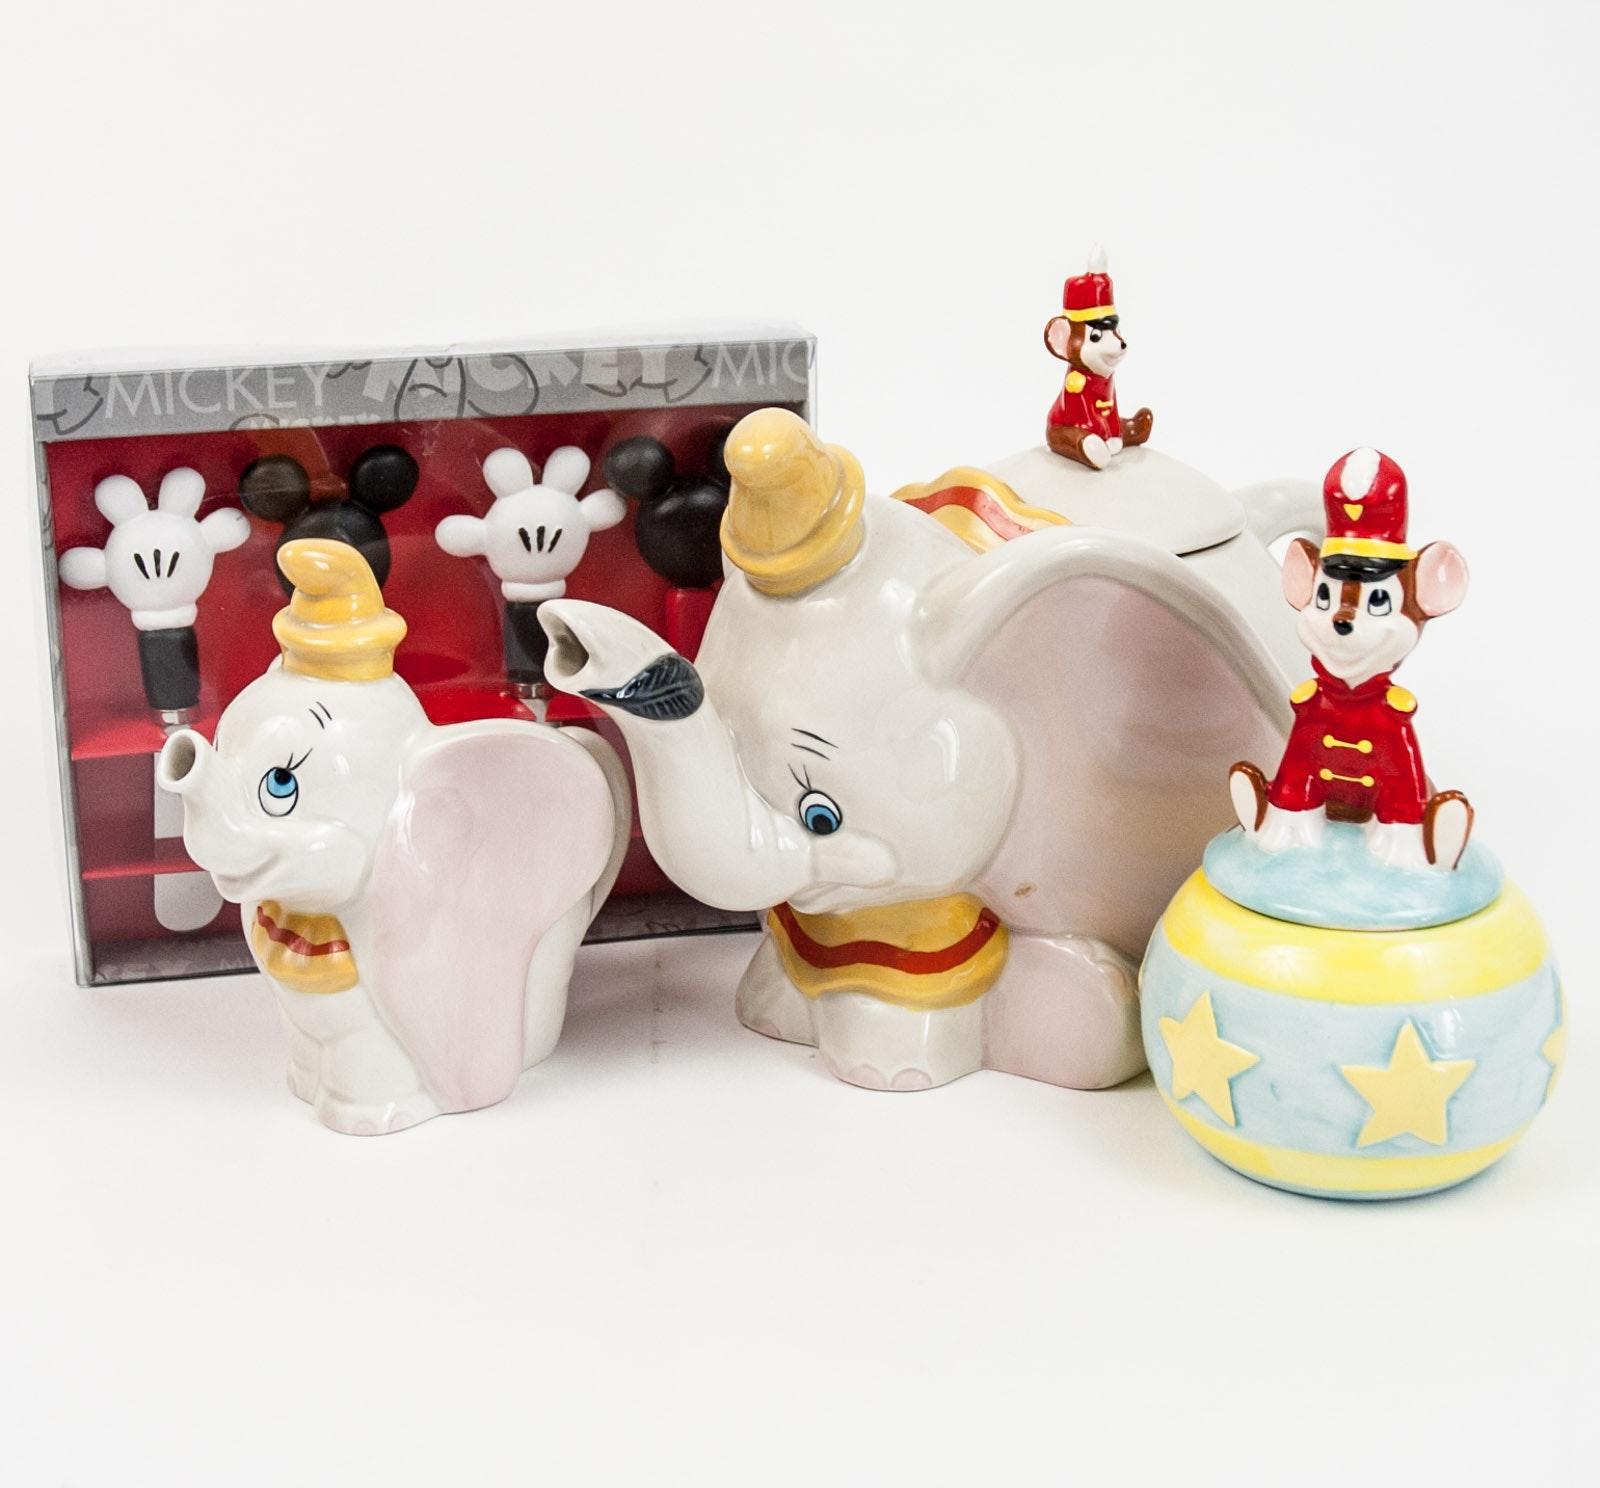 Vintage Disney Themed Decor